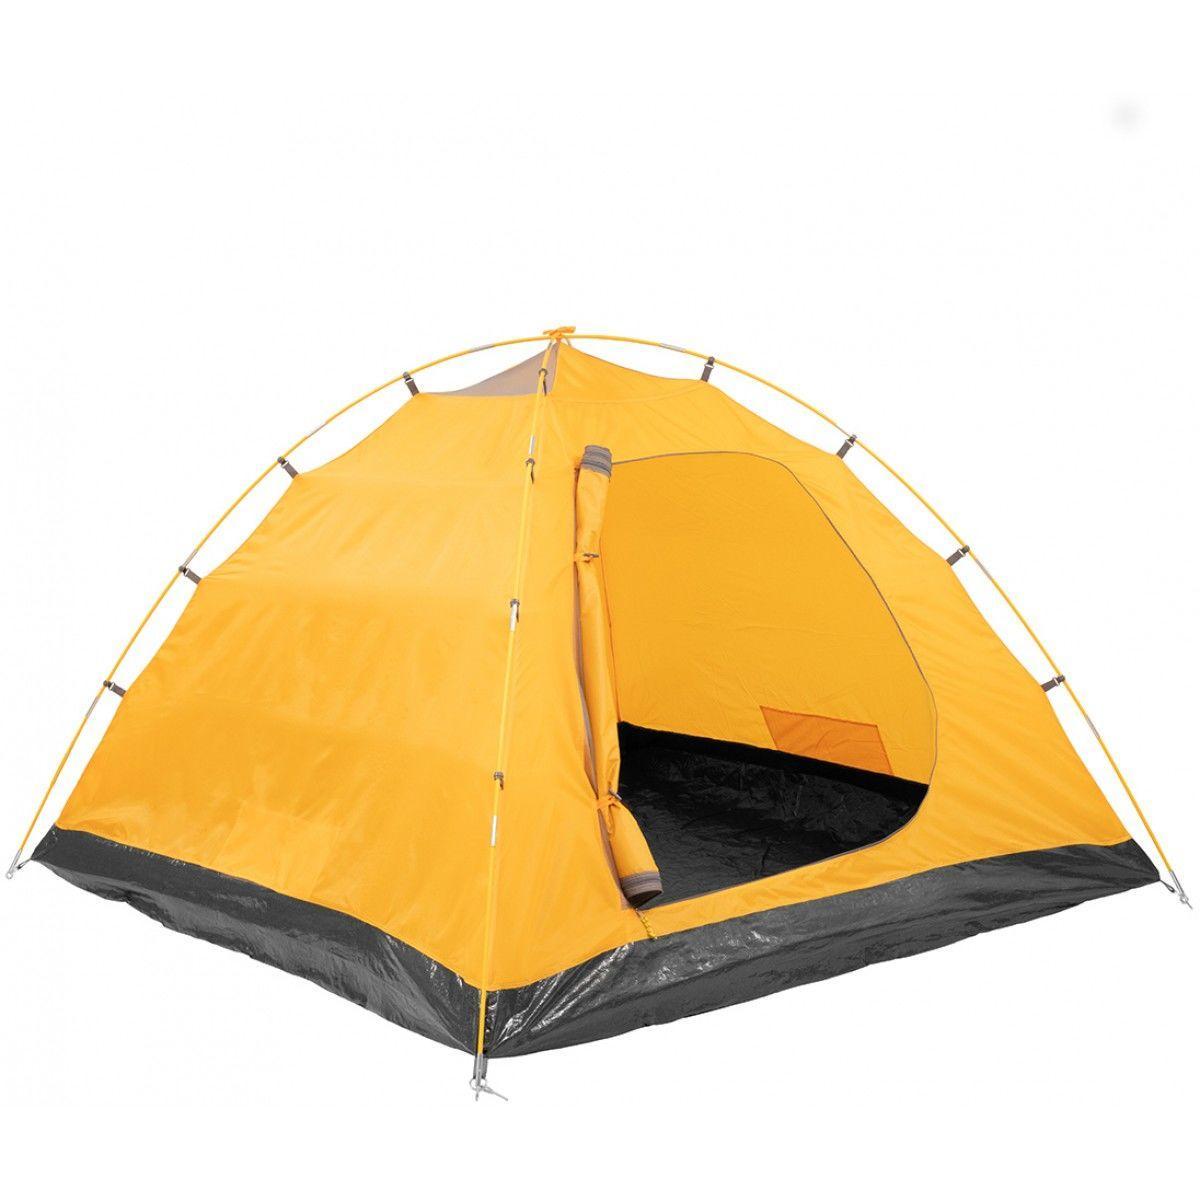 Палатка MUSSON-3 Helios зеленый-оранжевый HS-2366-3 GO - фото 7